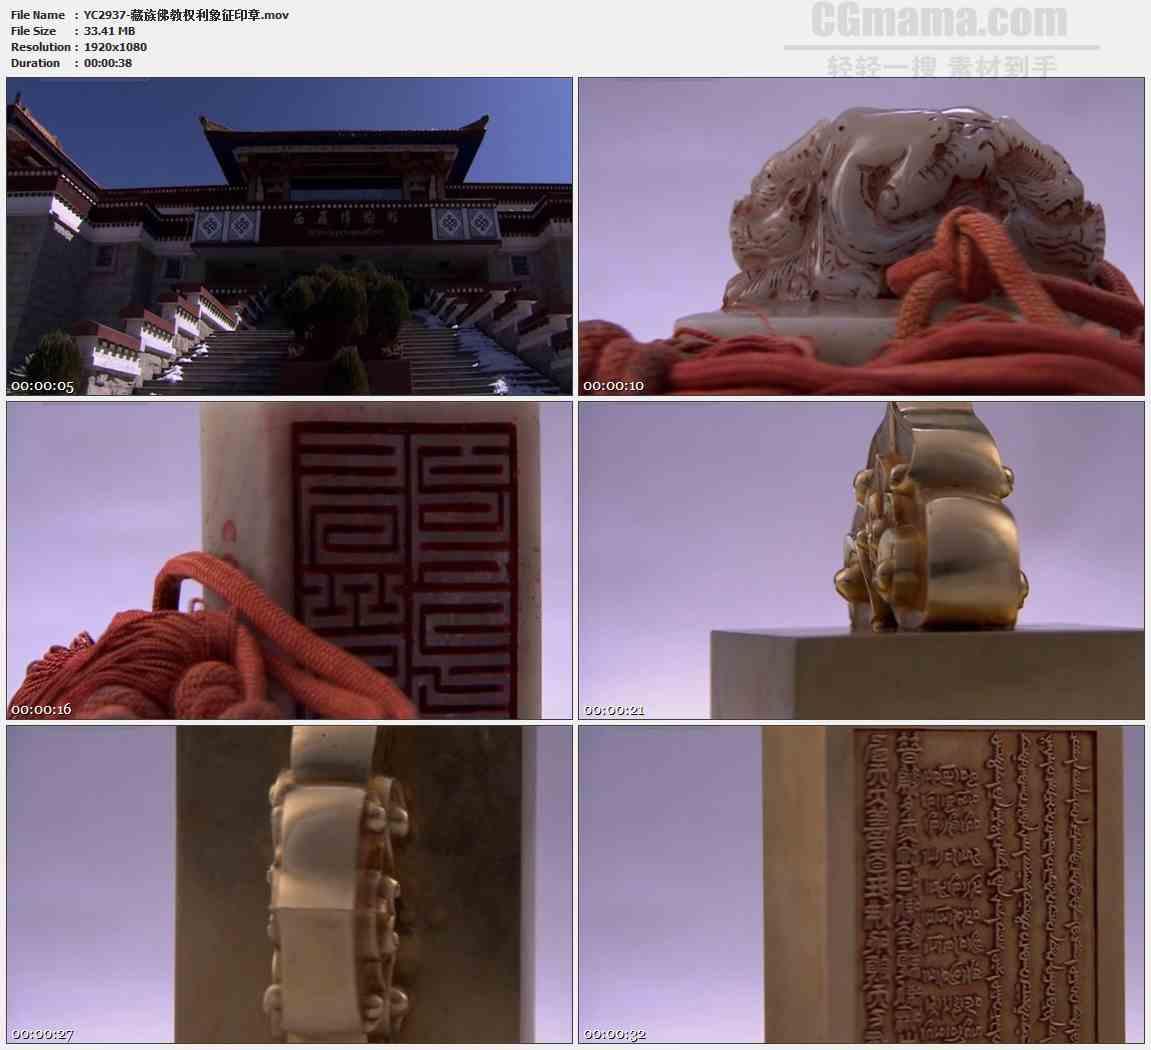 YC2937-西藏藏族佛教权利象征印章高清实拍视频素材